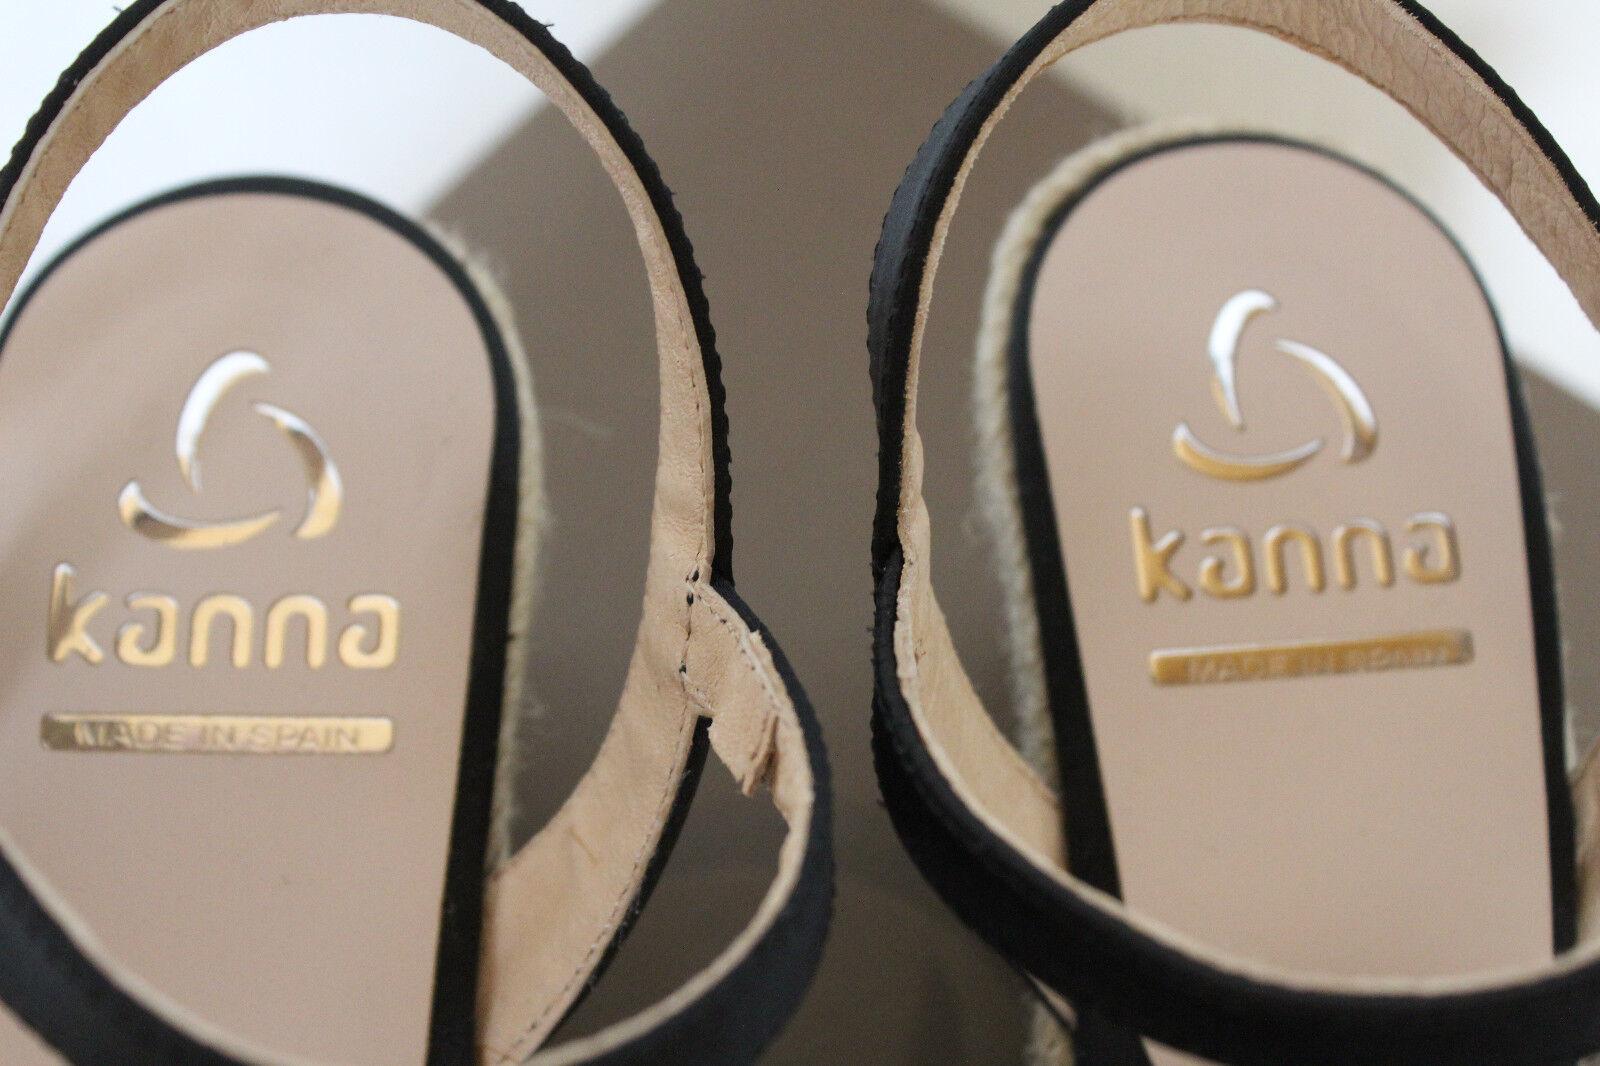 Kanna KV8083 Wedges,Damen Raso 95 Negro Sandalen Wedges,Damen KV8083 Gr.36,neu,LP 672a0d